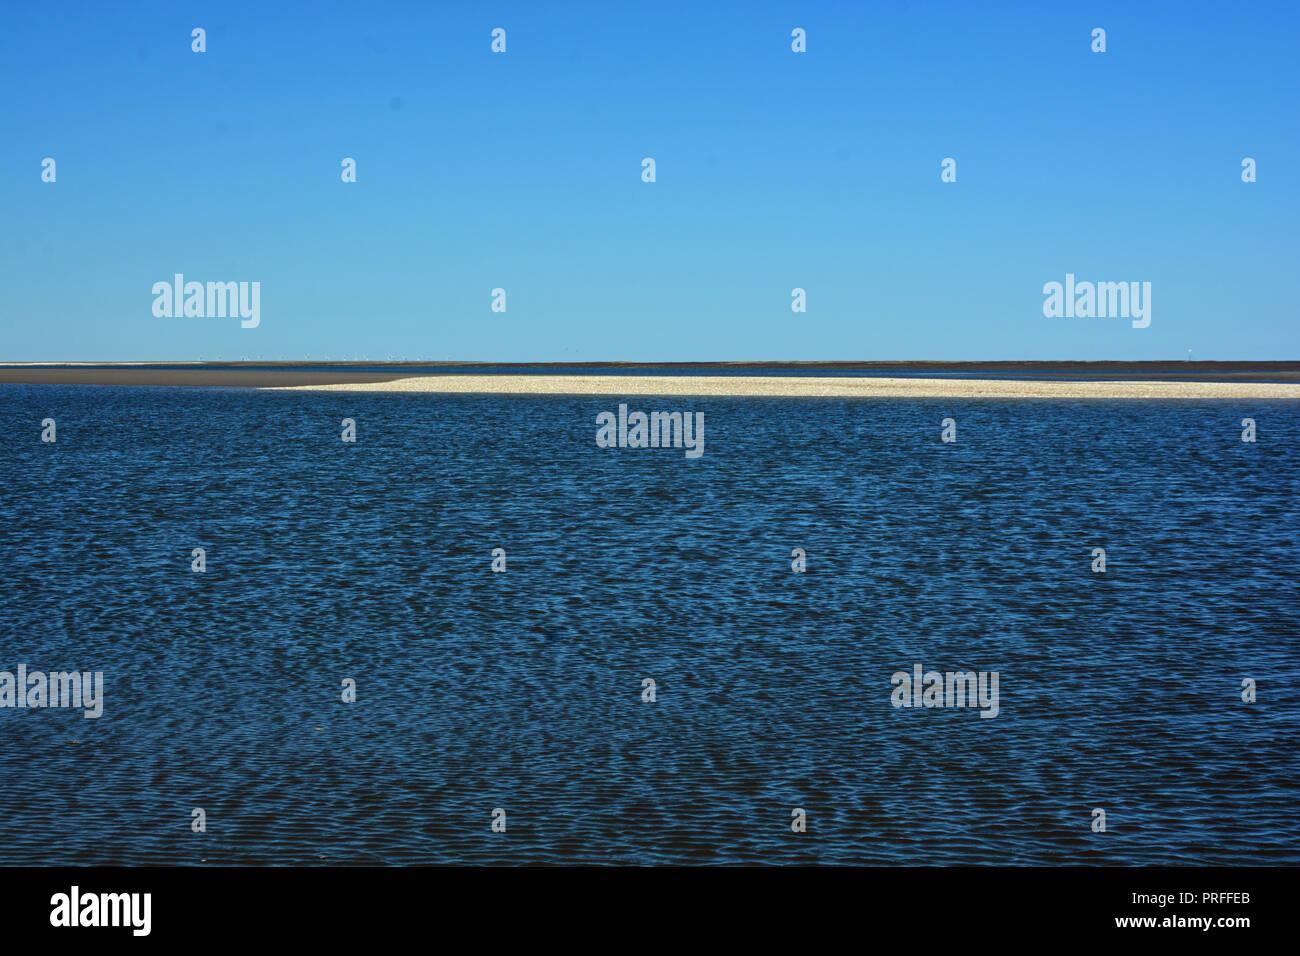 Wattenmeer Muschelbank Hintergrund Stockbild